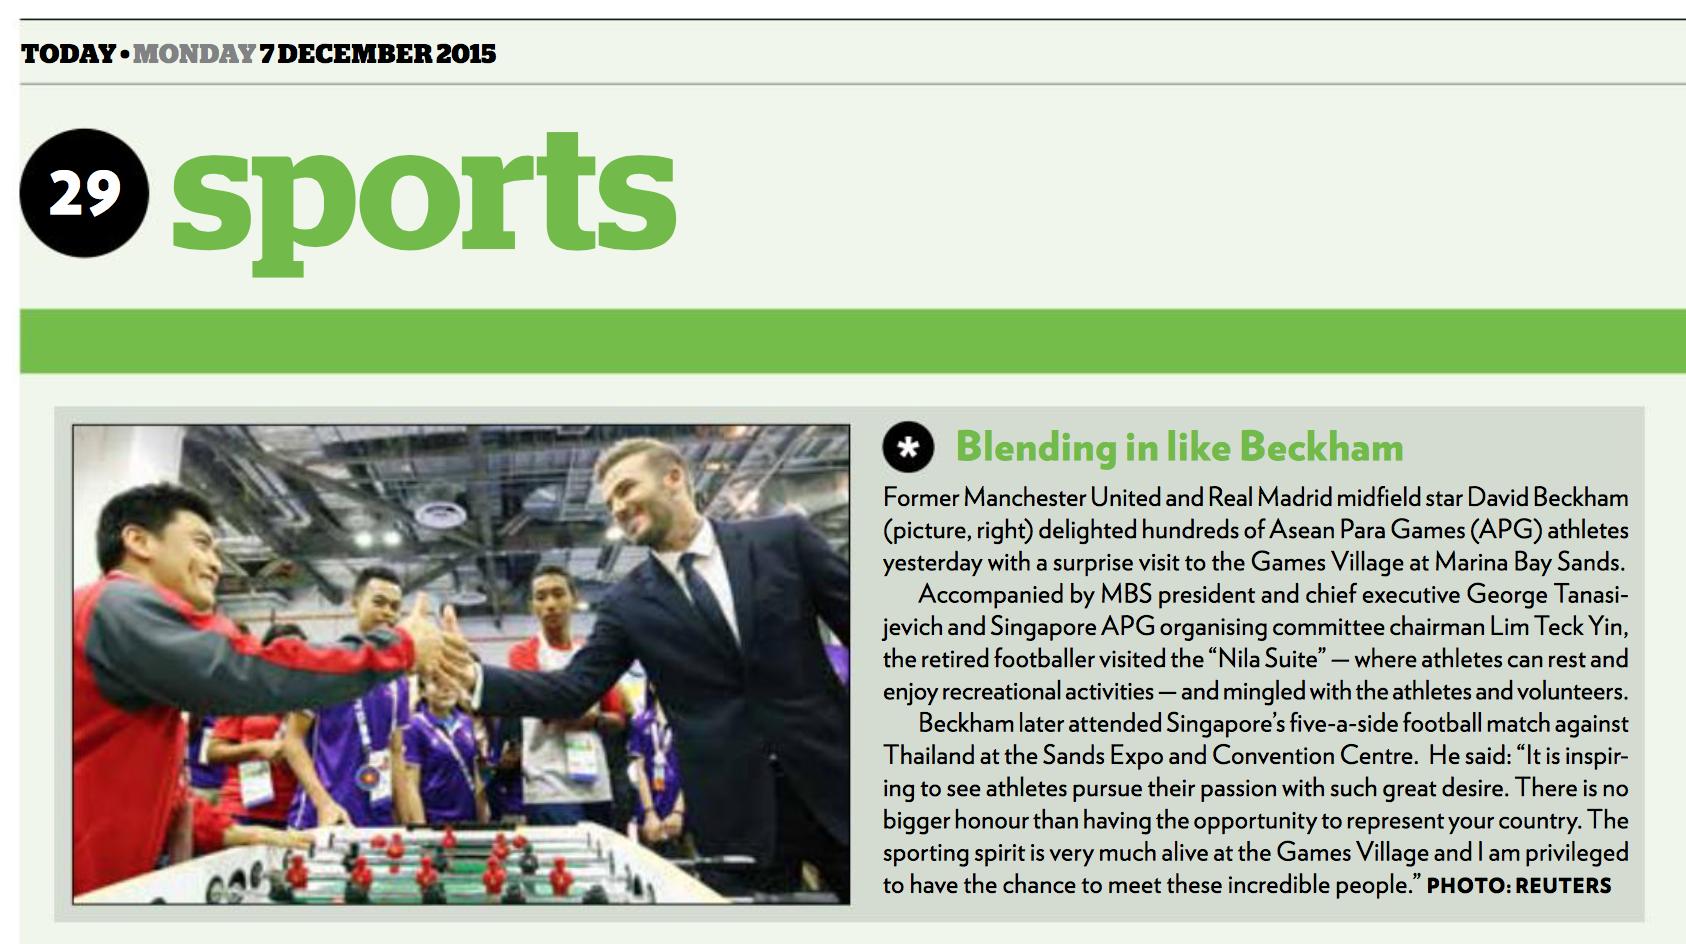 David Beckham visit, 8th ASEAN Para Games, TODAY (www.todayonline.com)